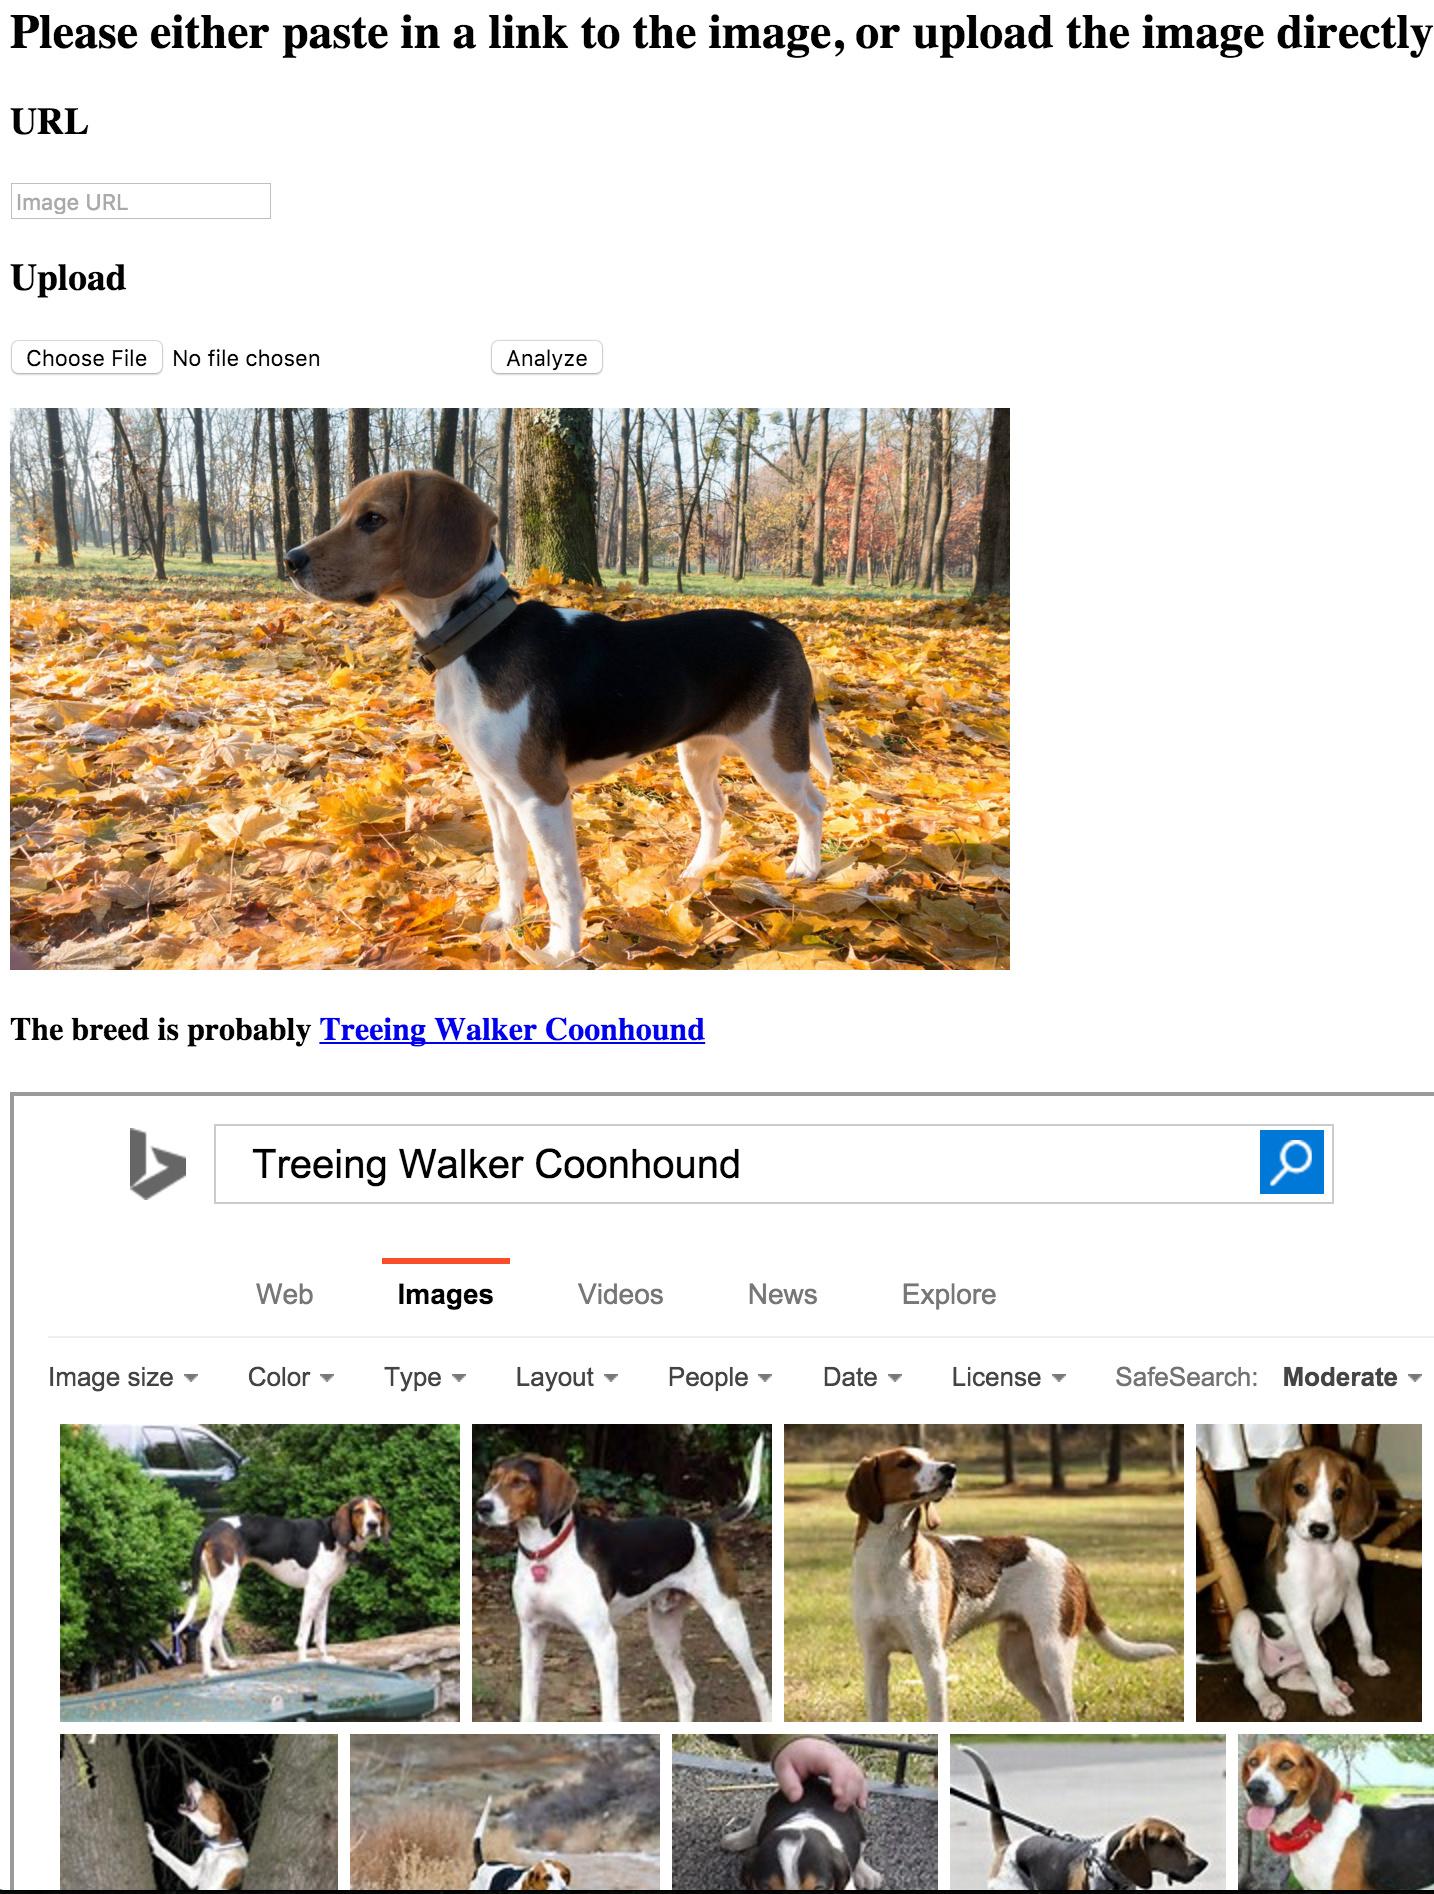 Beagle slightly misidentified